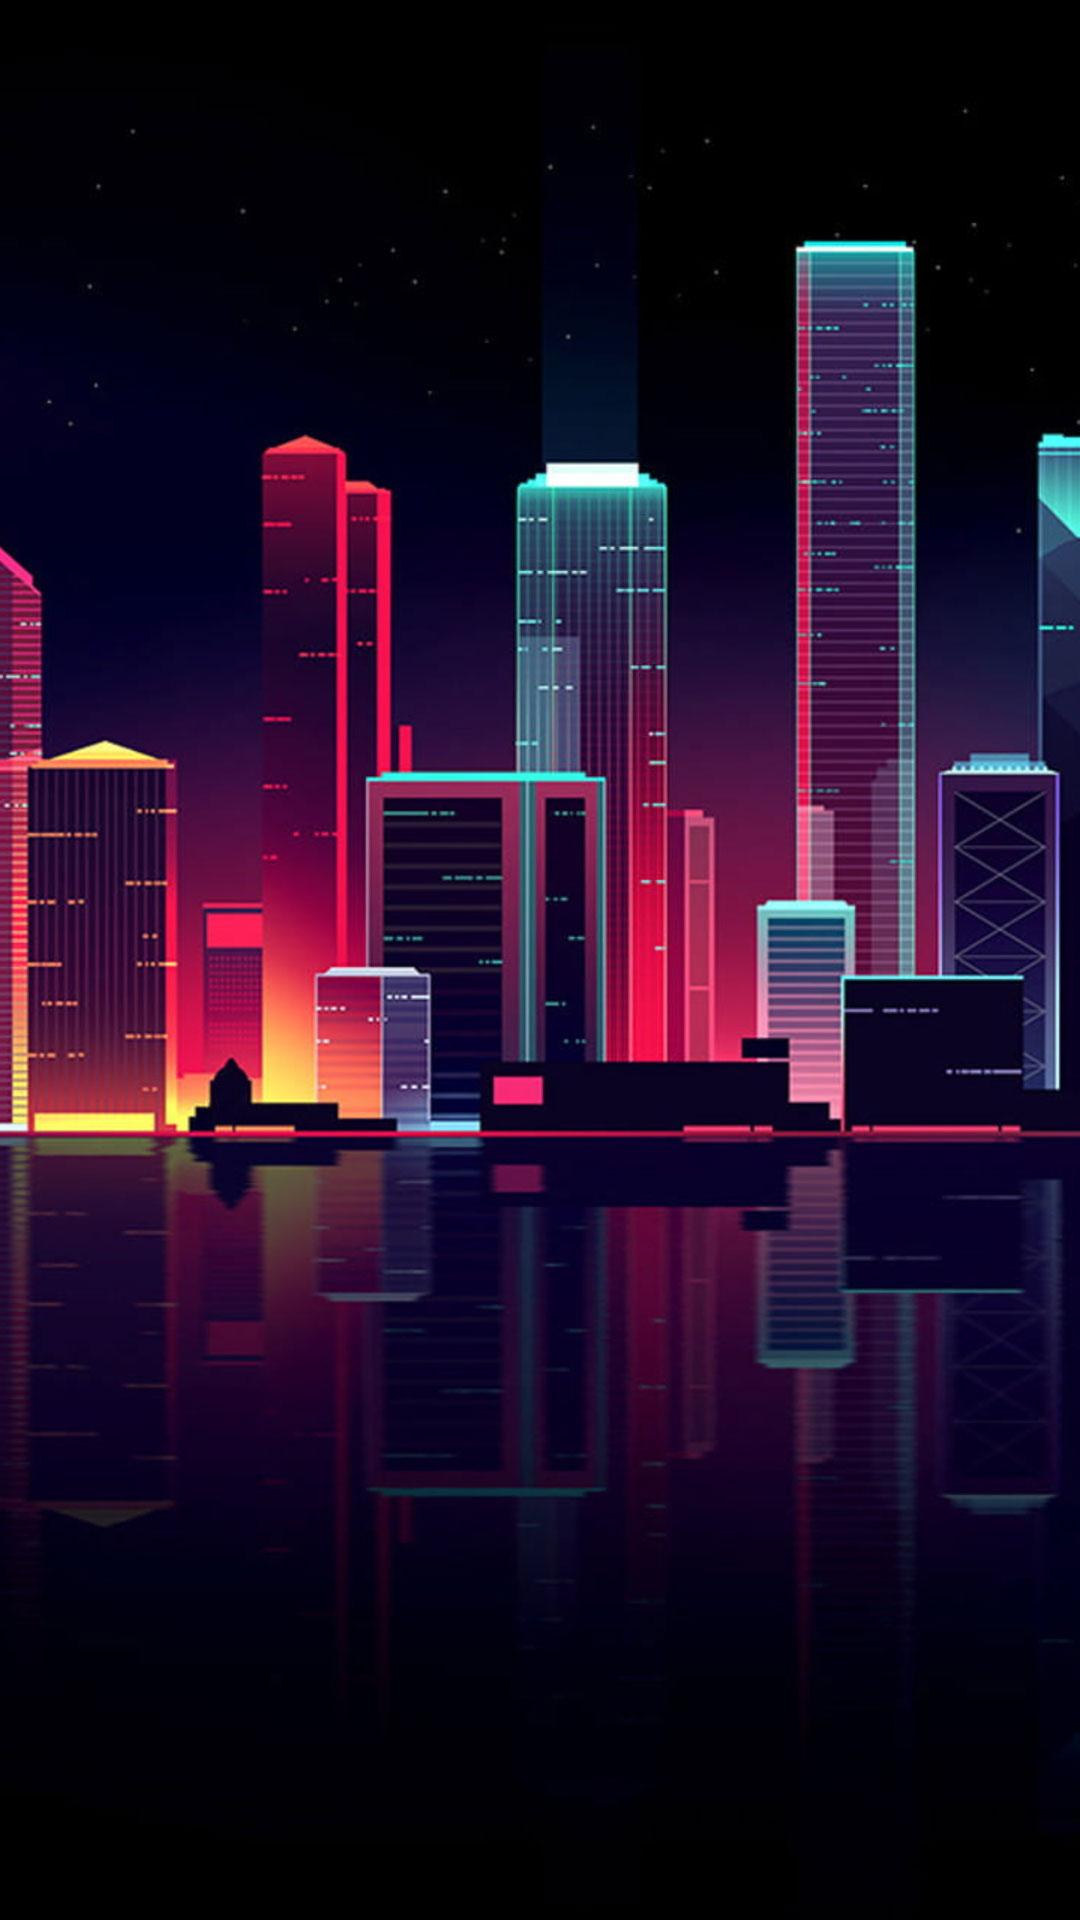 Night Neon City Wallpaper